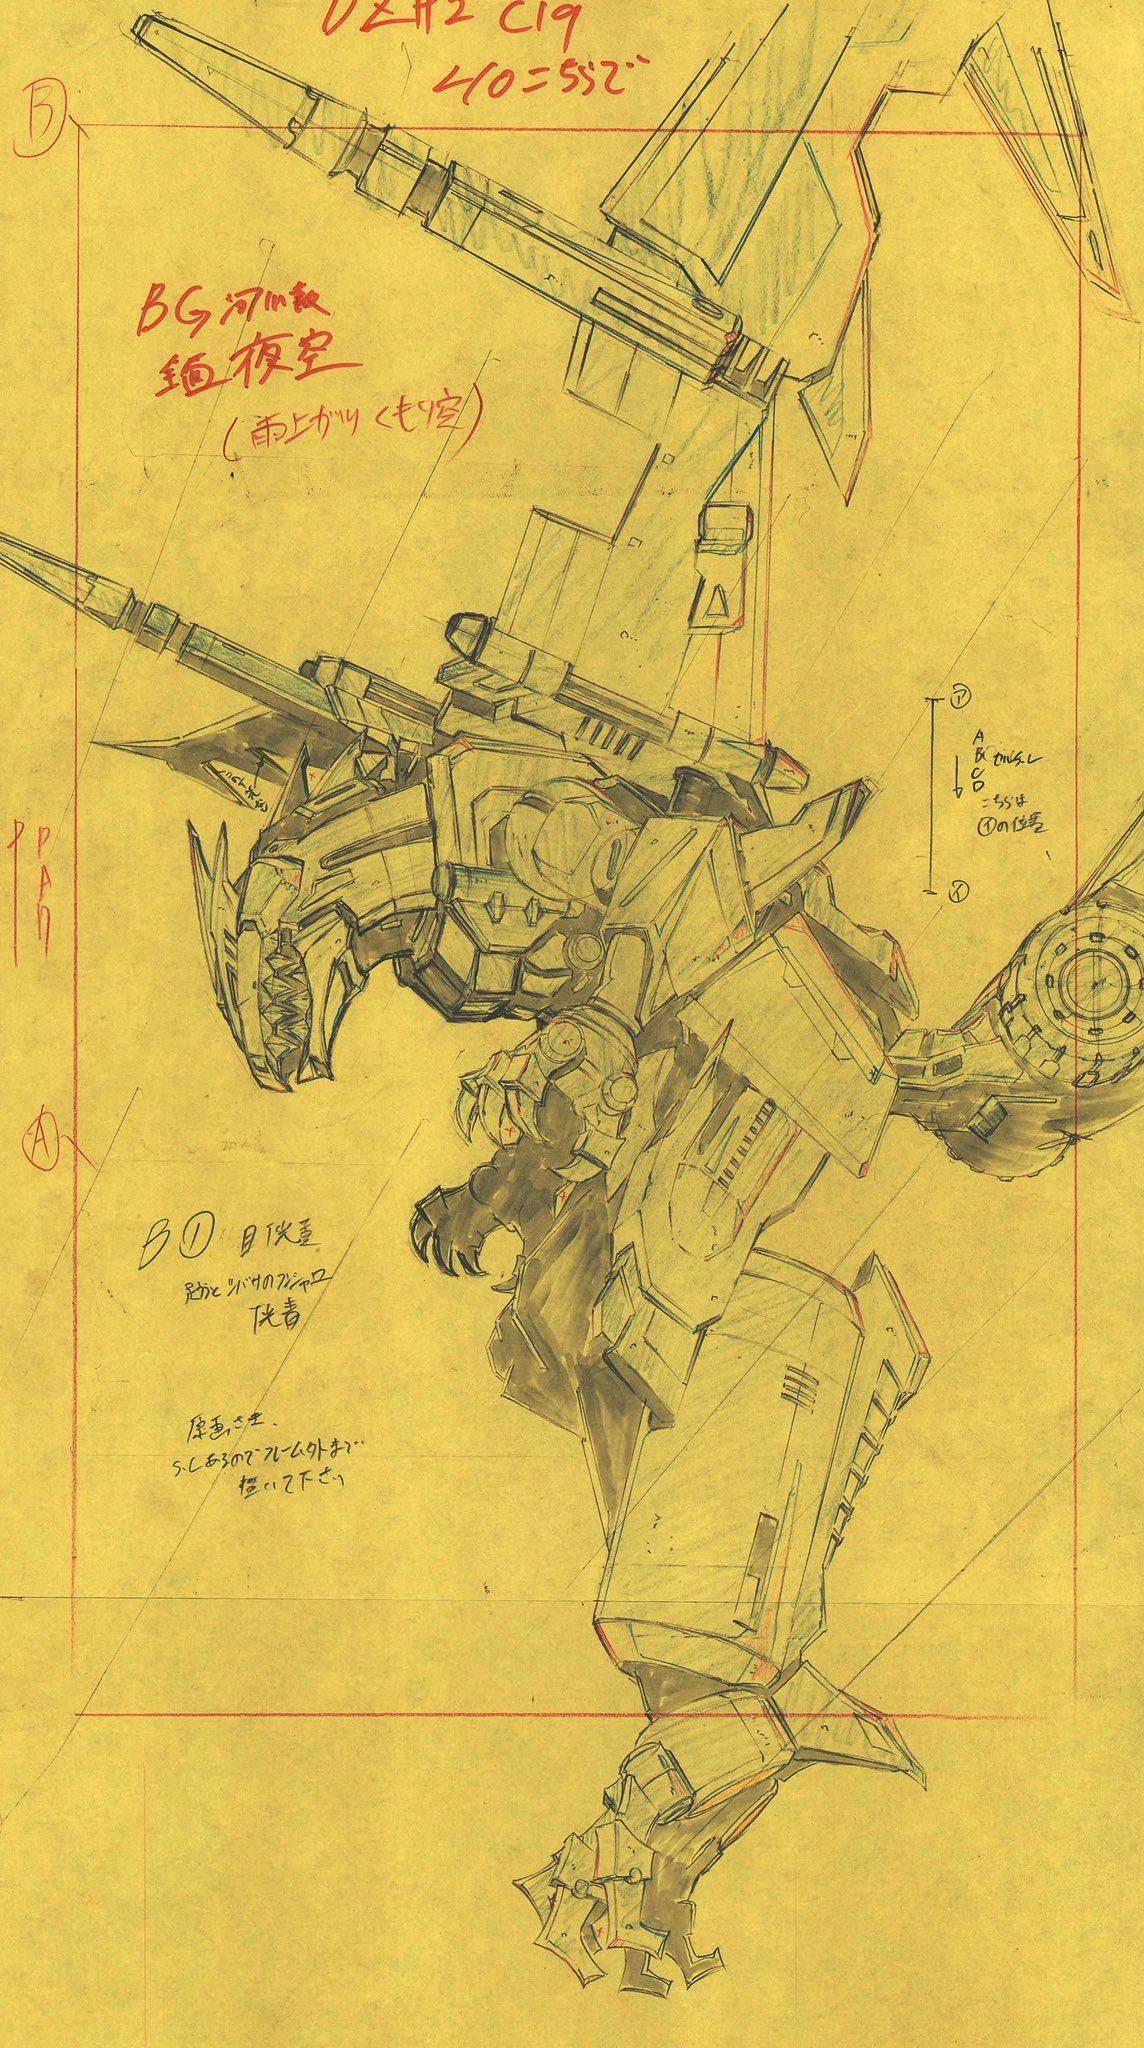 SSSS.Dynazenon 02 - Gen Asano - Genga